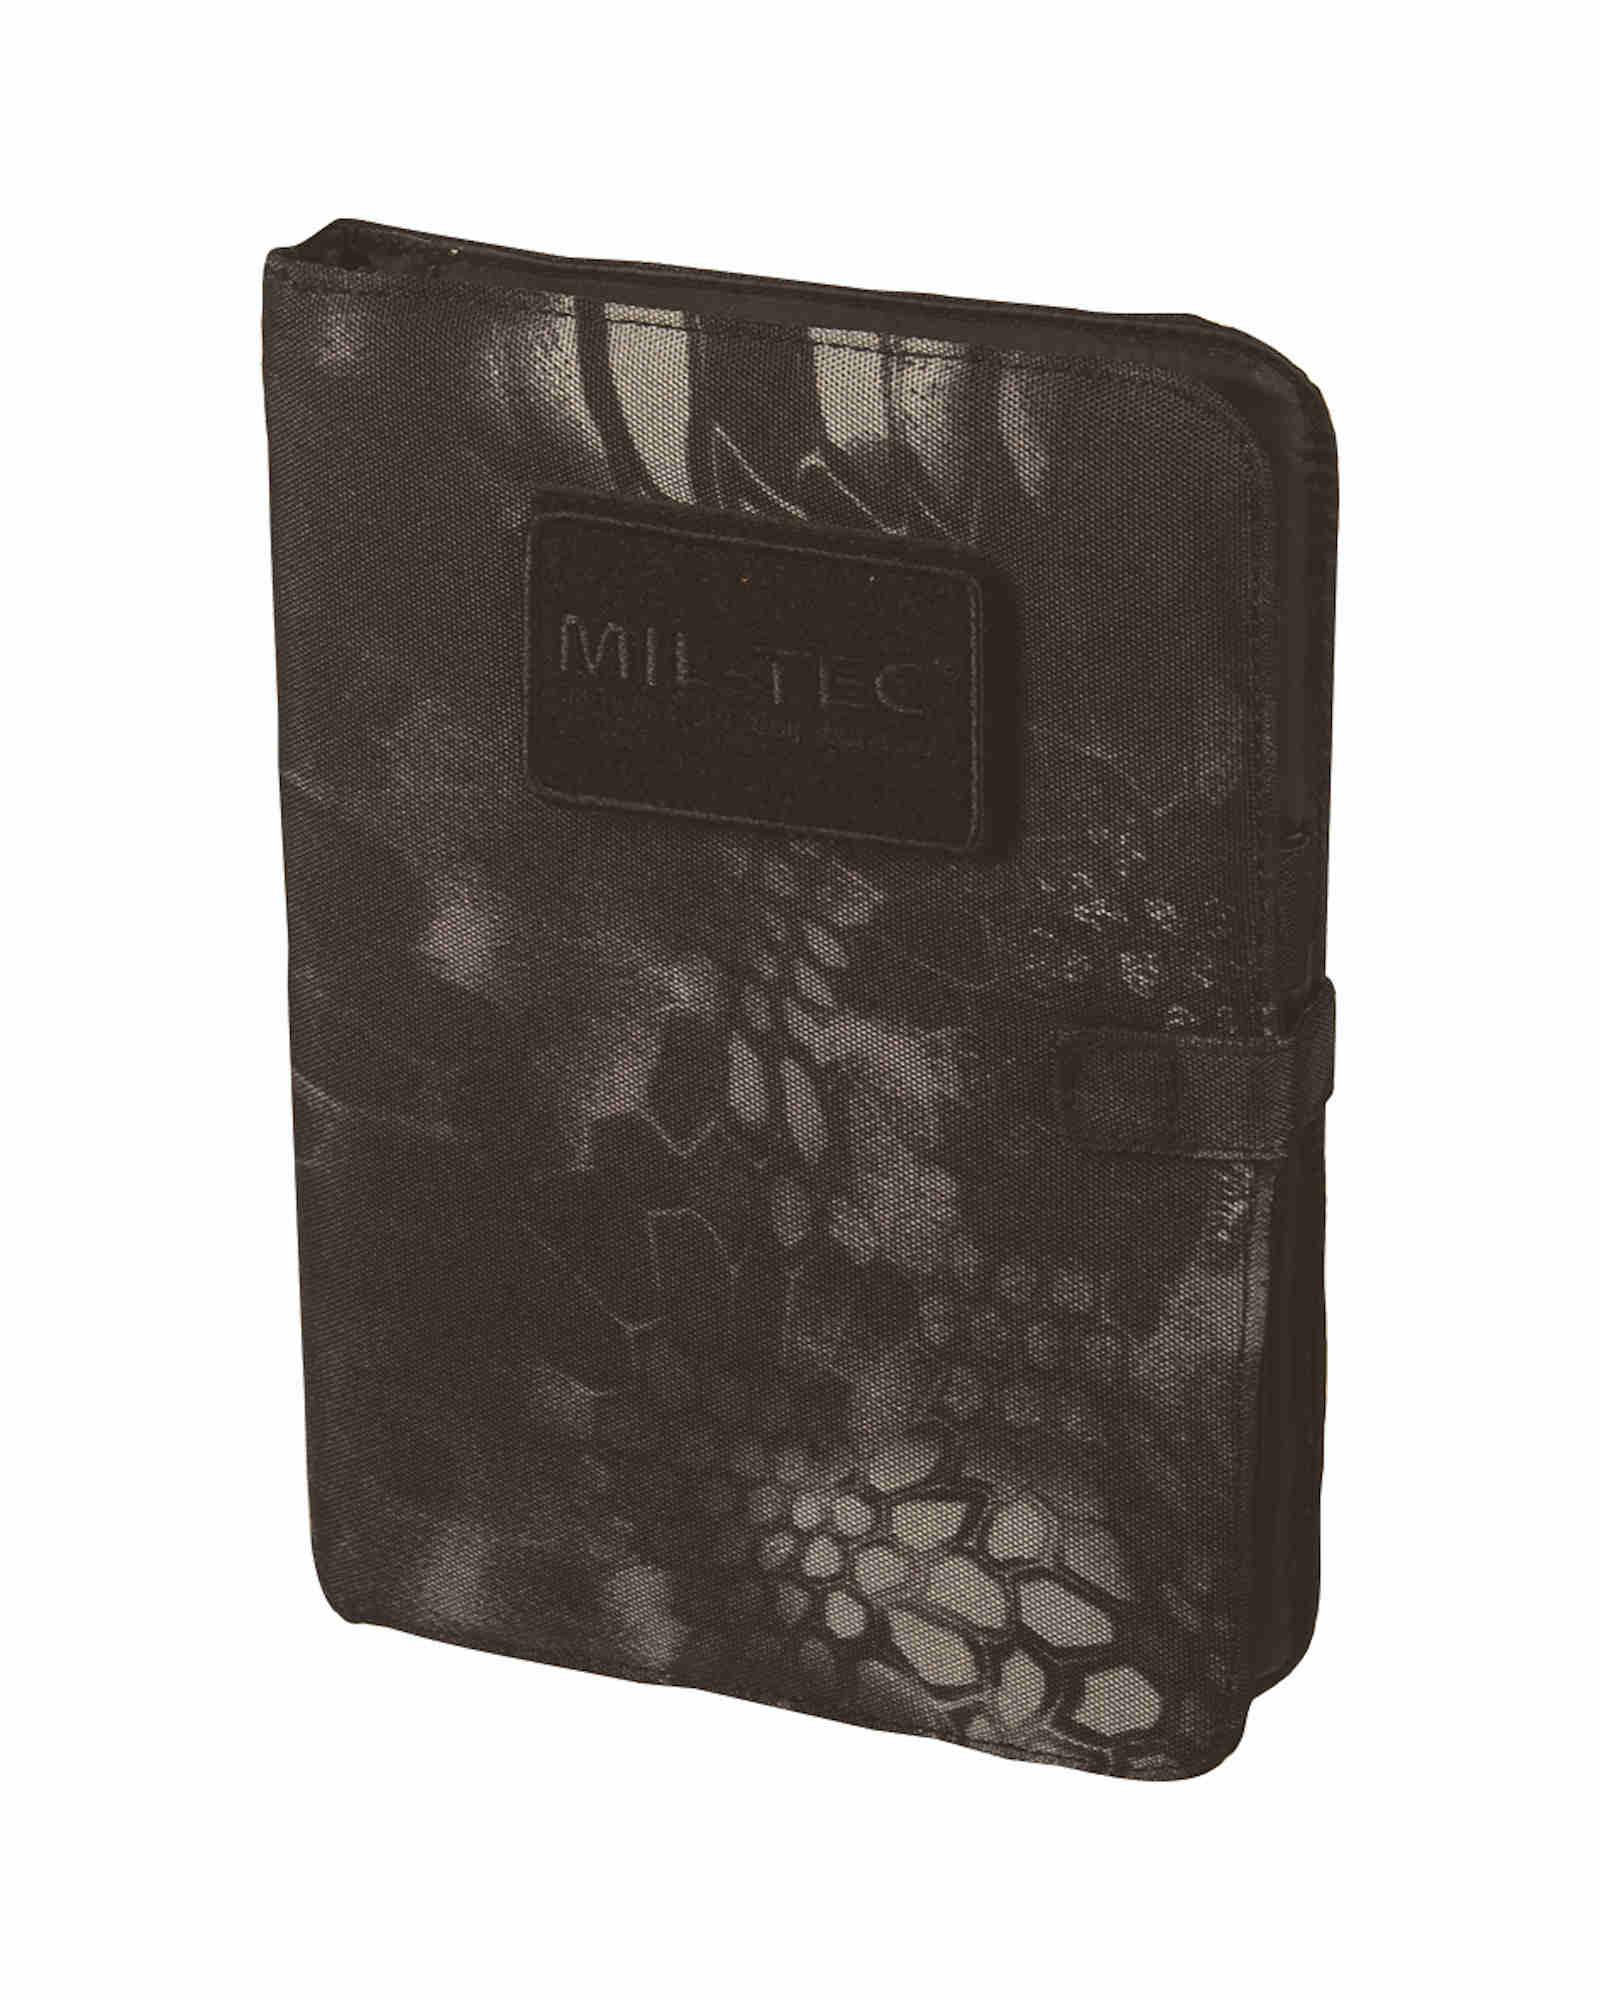 Mil-tec Tactical Notebook Medium Mandra Night Notizbuch Herren-accessoires